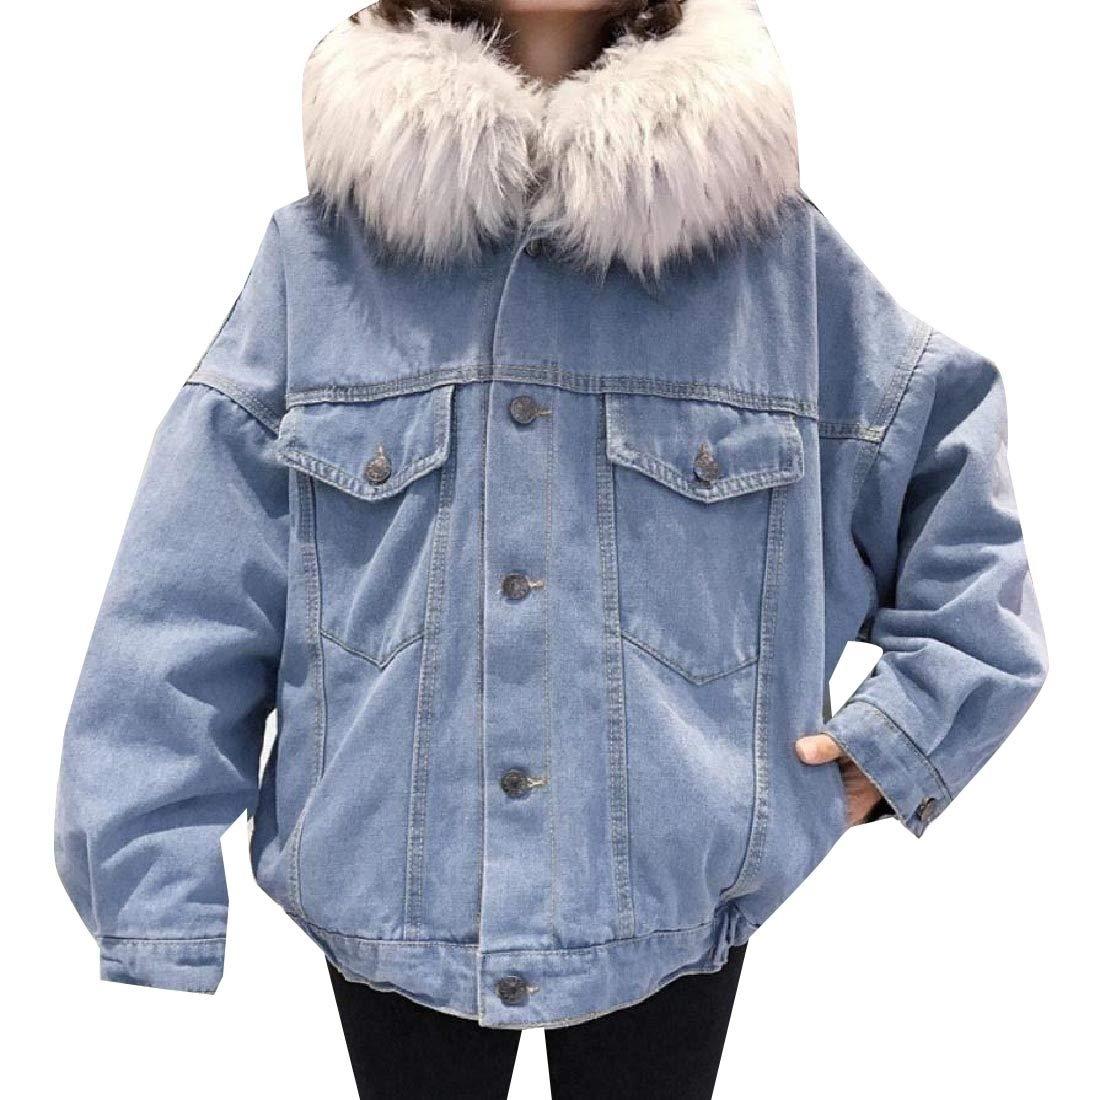 YUNY Womens Outwear Faux-Fur Trim Plus Velvet Simple Denim Jacket Grey L